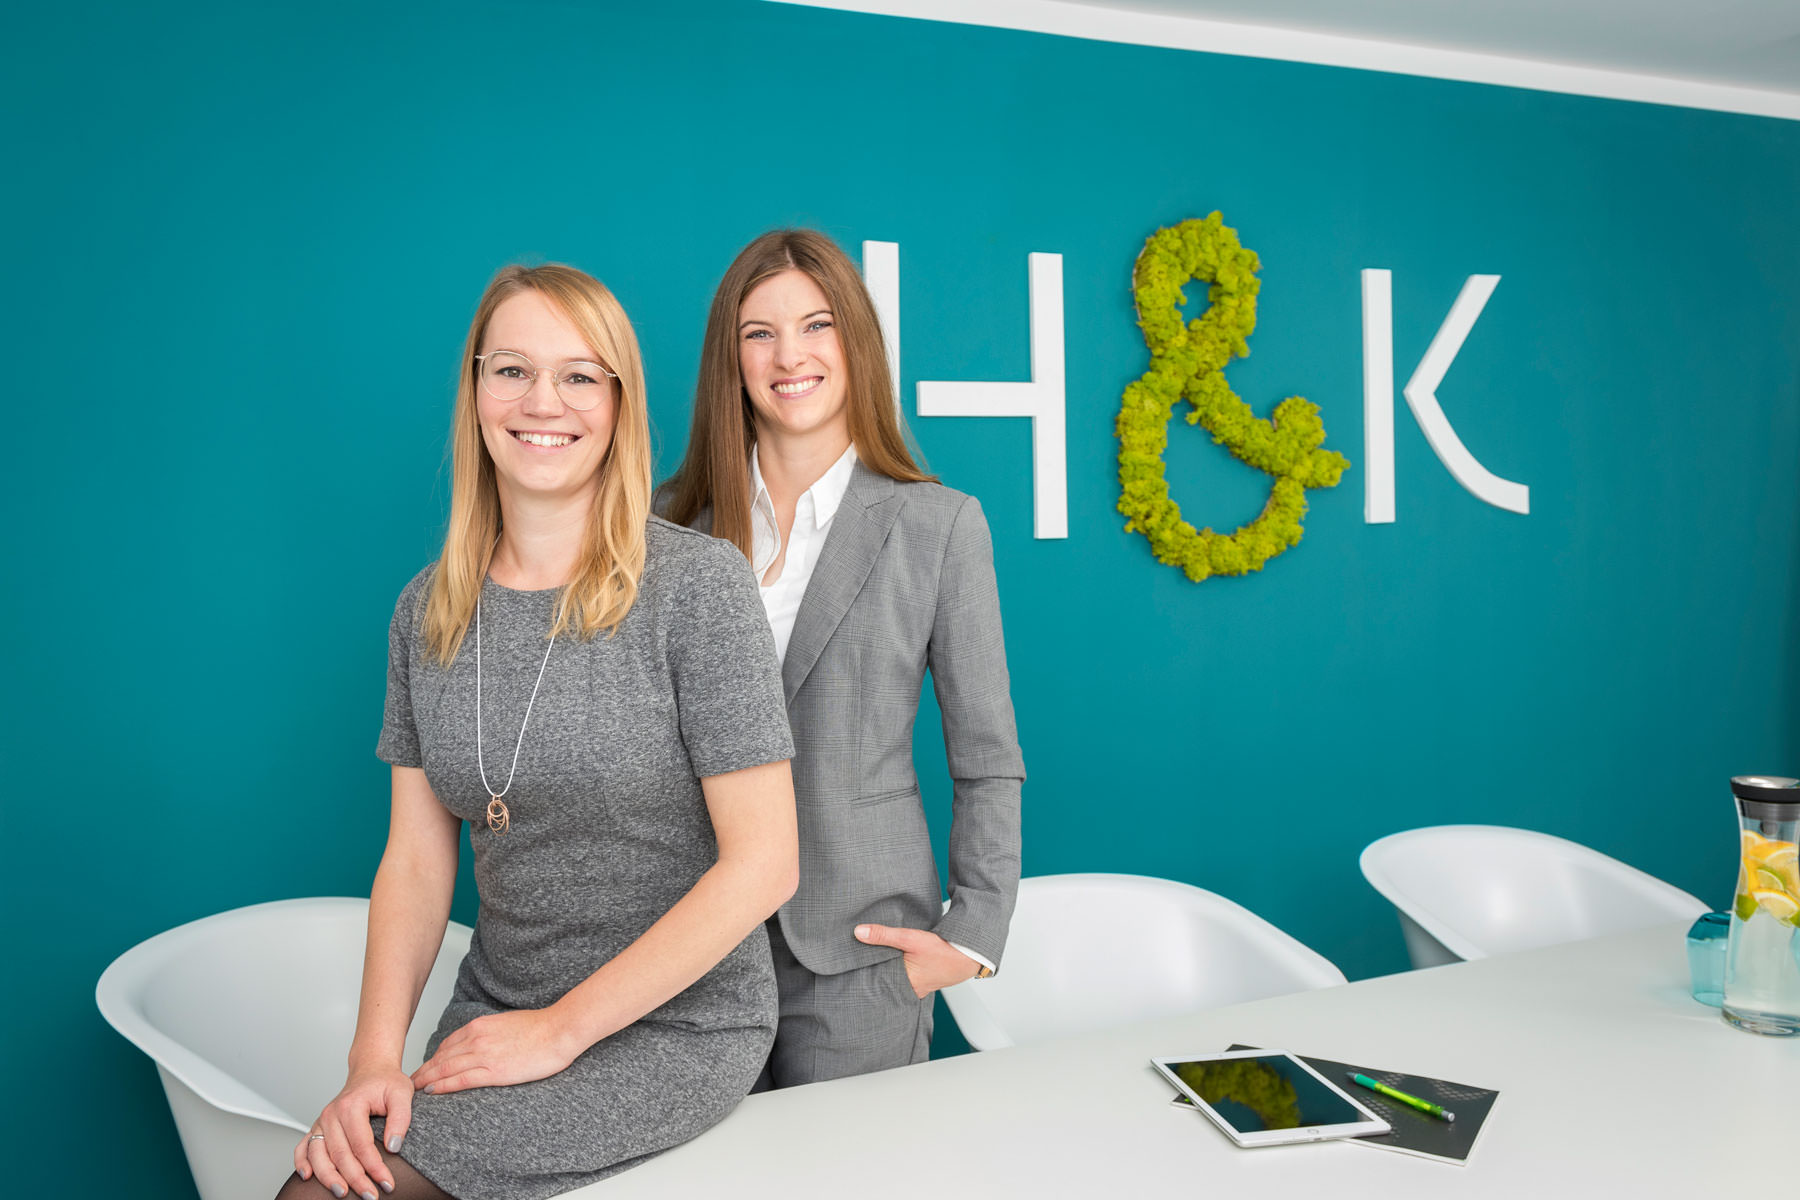 Steuerberatung, Steuerberaterinnen in Bielefeld